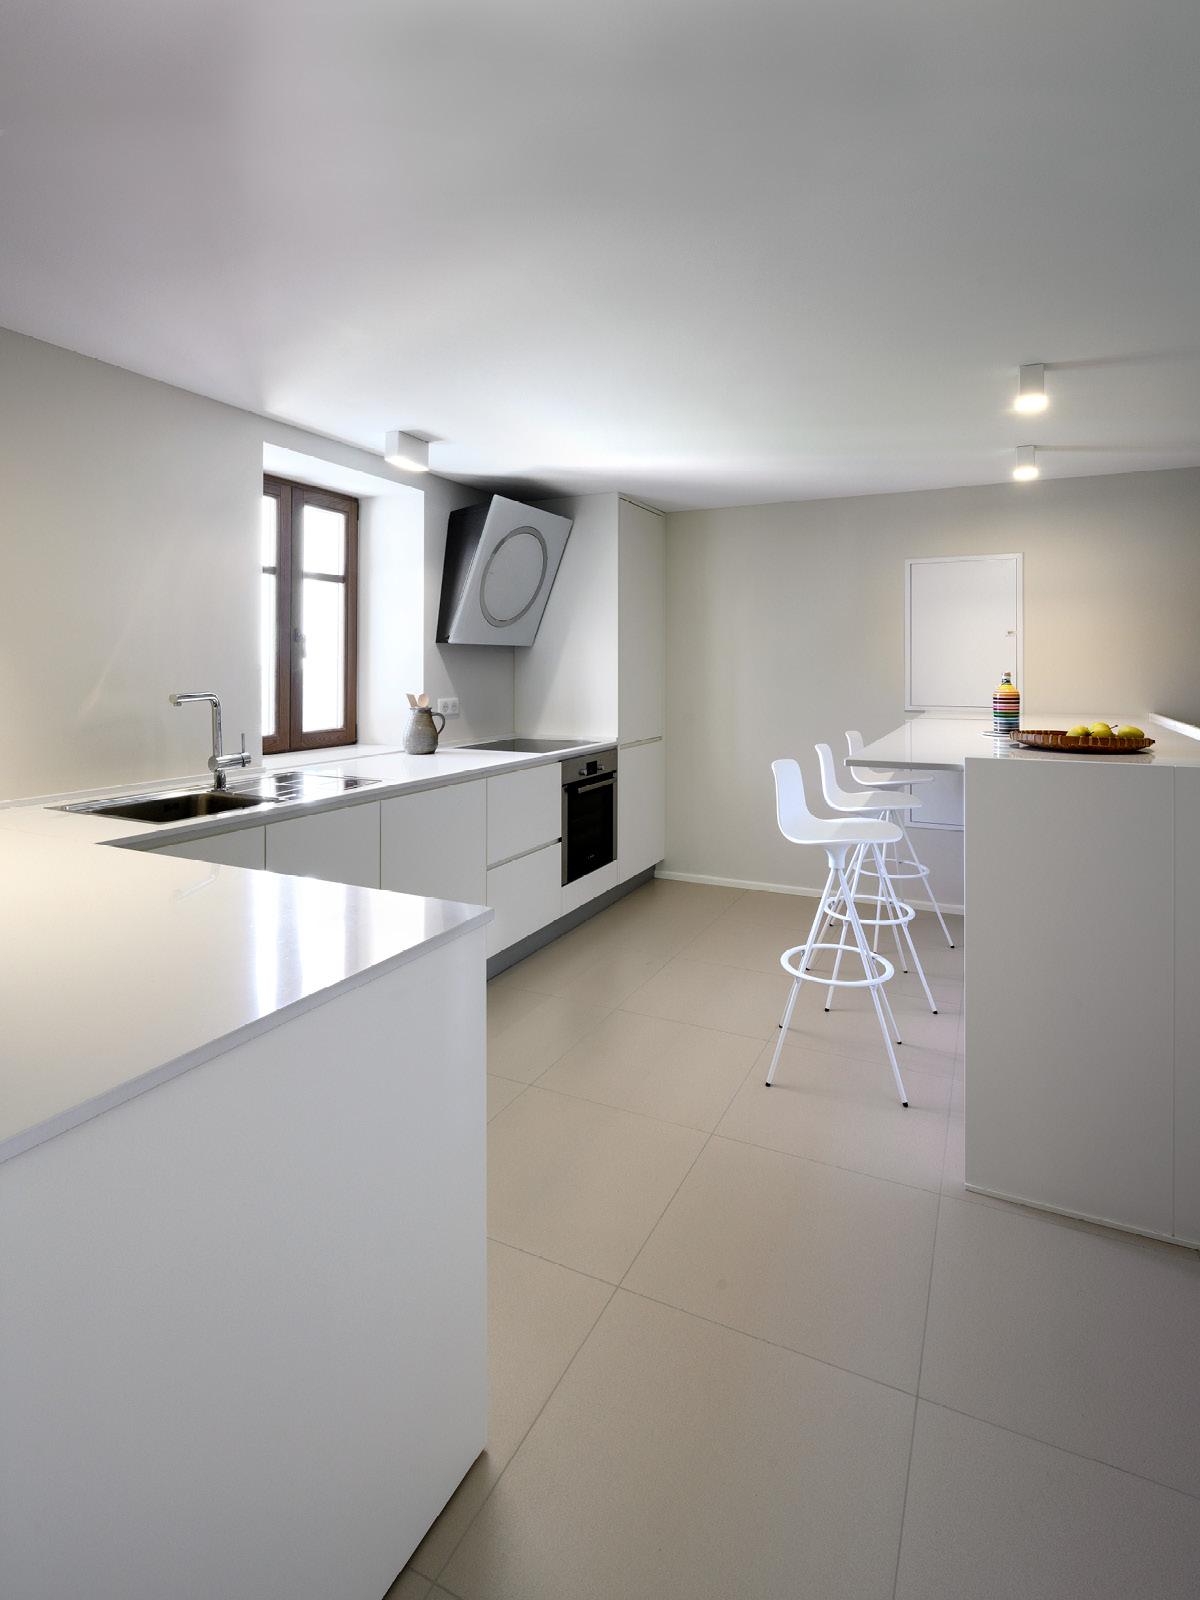 Maison Forte /Houte-Savoie, France – Project by Bertoncello Architetti Associati Painted kitchen